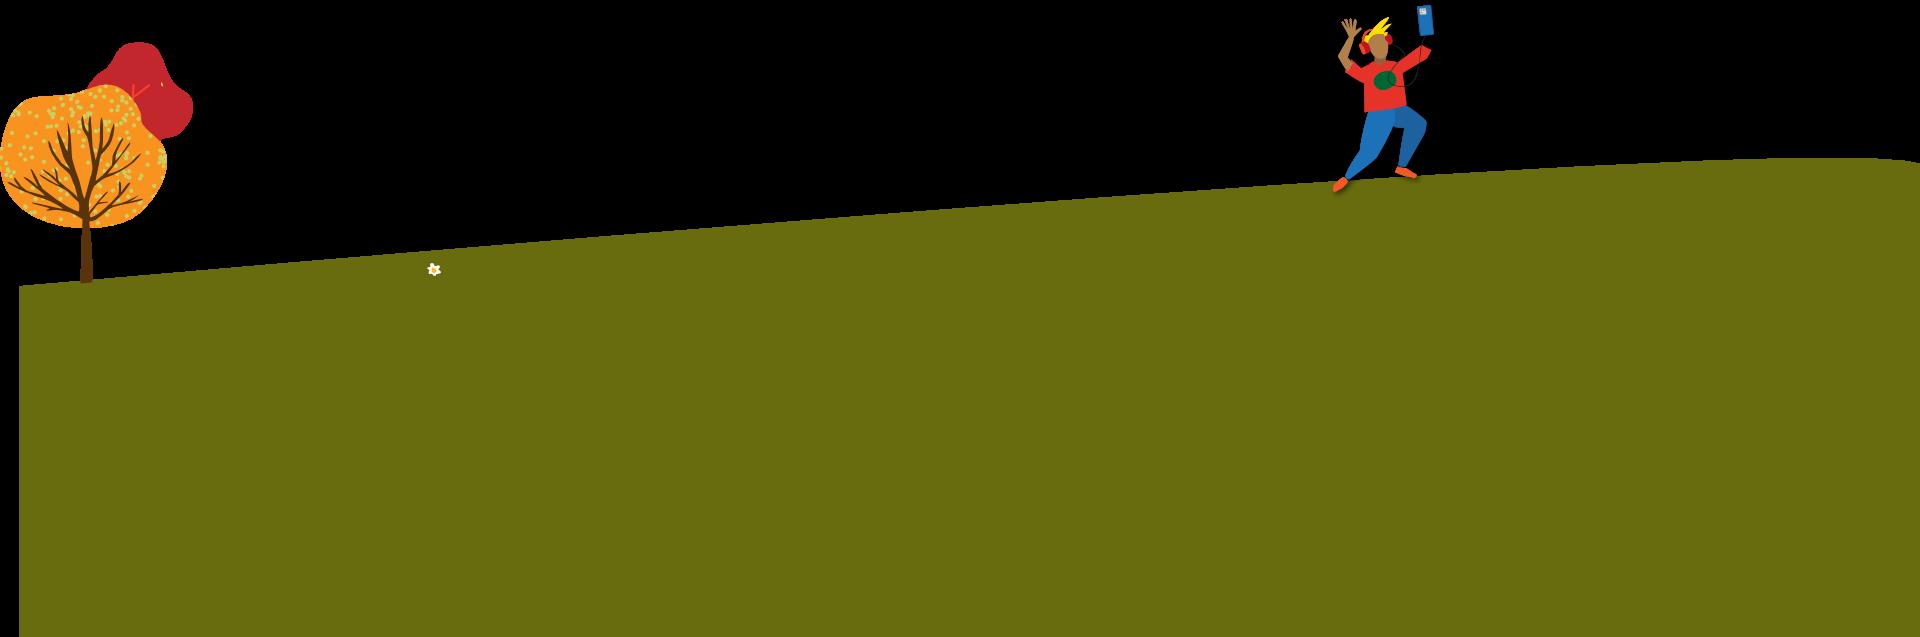 Banner layer 6